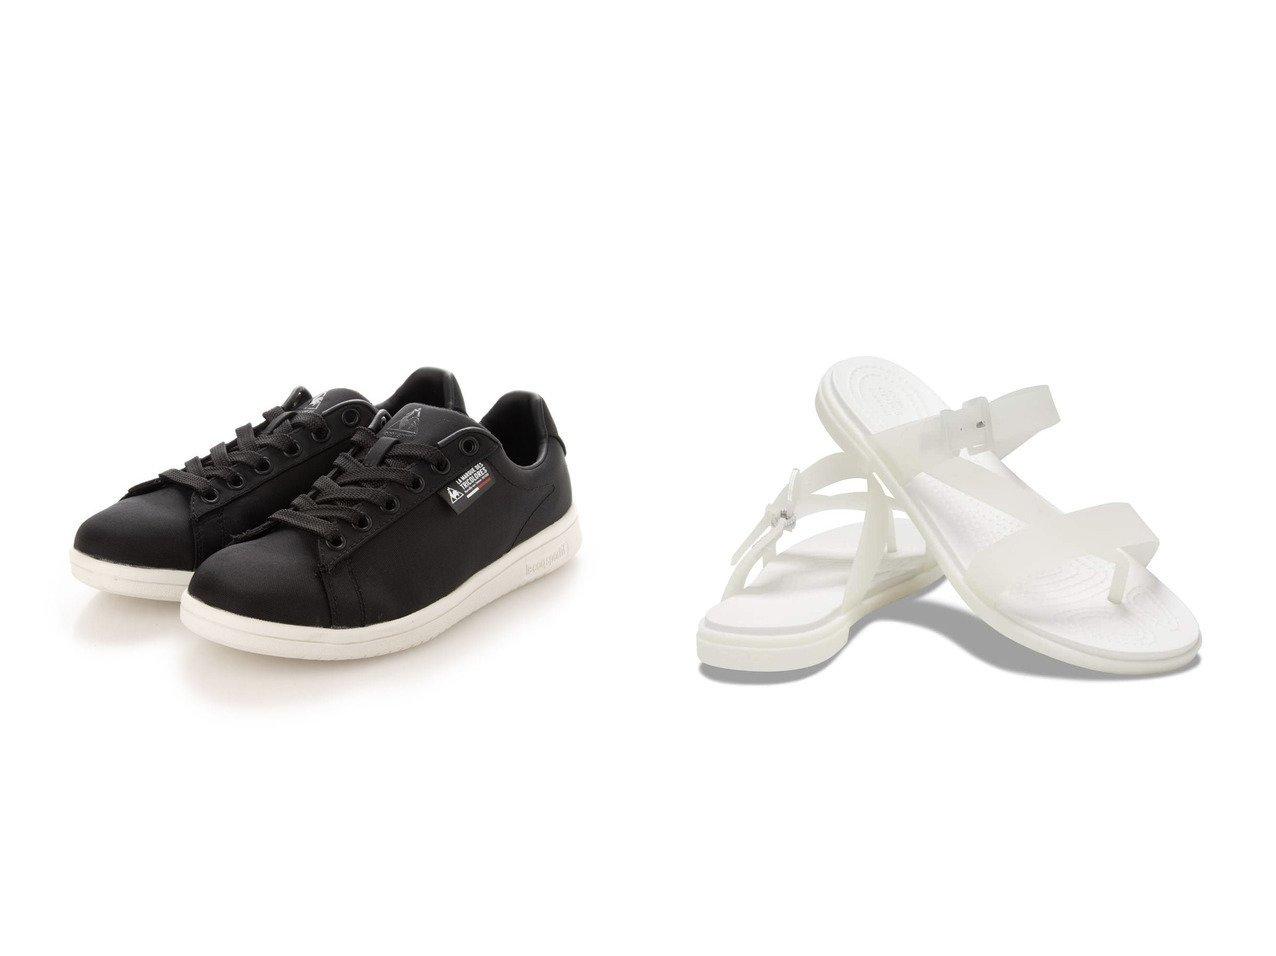 【le coq sportif/ルコックスポルティフ】のLA ローラン LA ROLAND R&【crocs/クロックス】のCrocs Tulum Translucent Toe Post W おすすめ!人気、トレンド・レディースファッションの通販 おすすめで人気の流行・トレンド、ファッションの通販商品 インテリア・家具・メンズファッション・キッズファッション・レディースファッション・服の通販 founy(ファニー) https://founy.com/ ファッション Fashion レディースファッション WOMEN 2021年 2021 2021春夏・S/S SS/Spring/Summer/2021 S/S・春夏 SS・Spring/Summer おすすめ Recommend 夏 Summer 春 Spring  ID:crp329100000051806